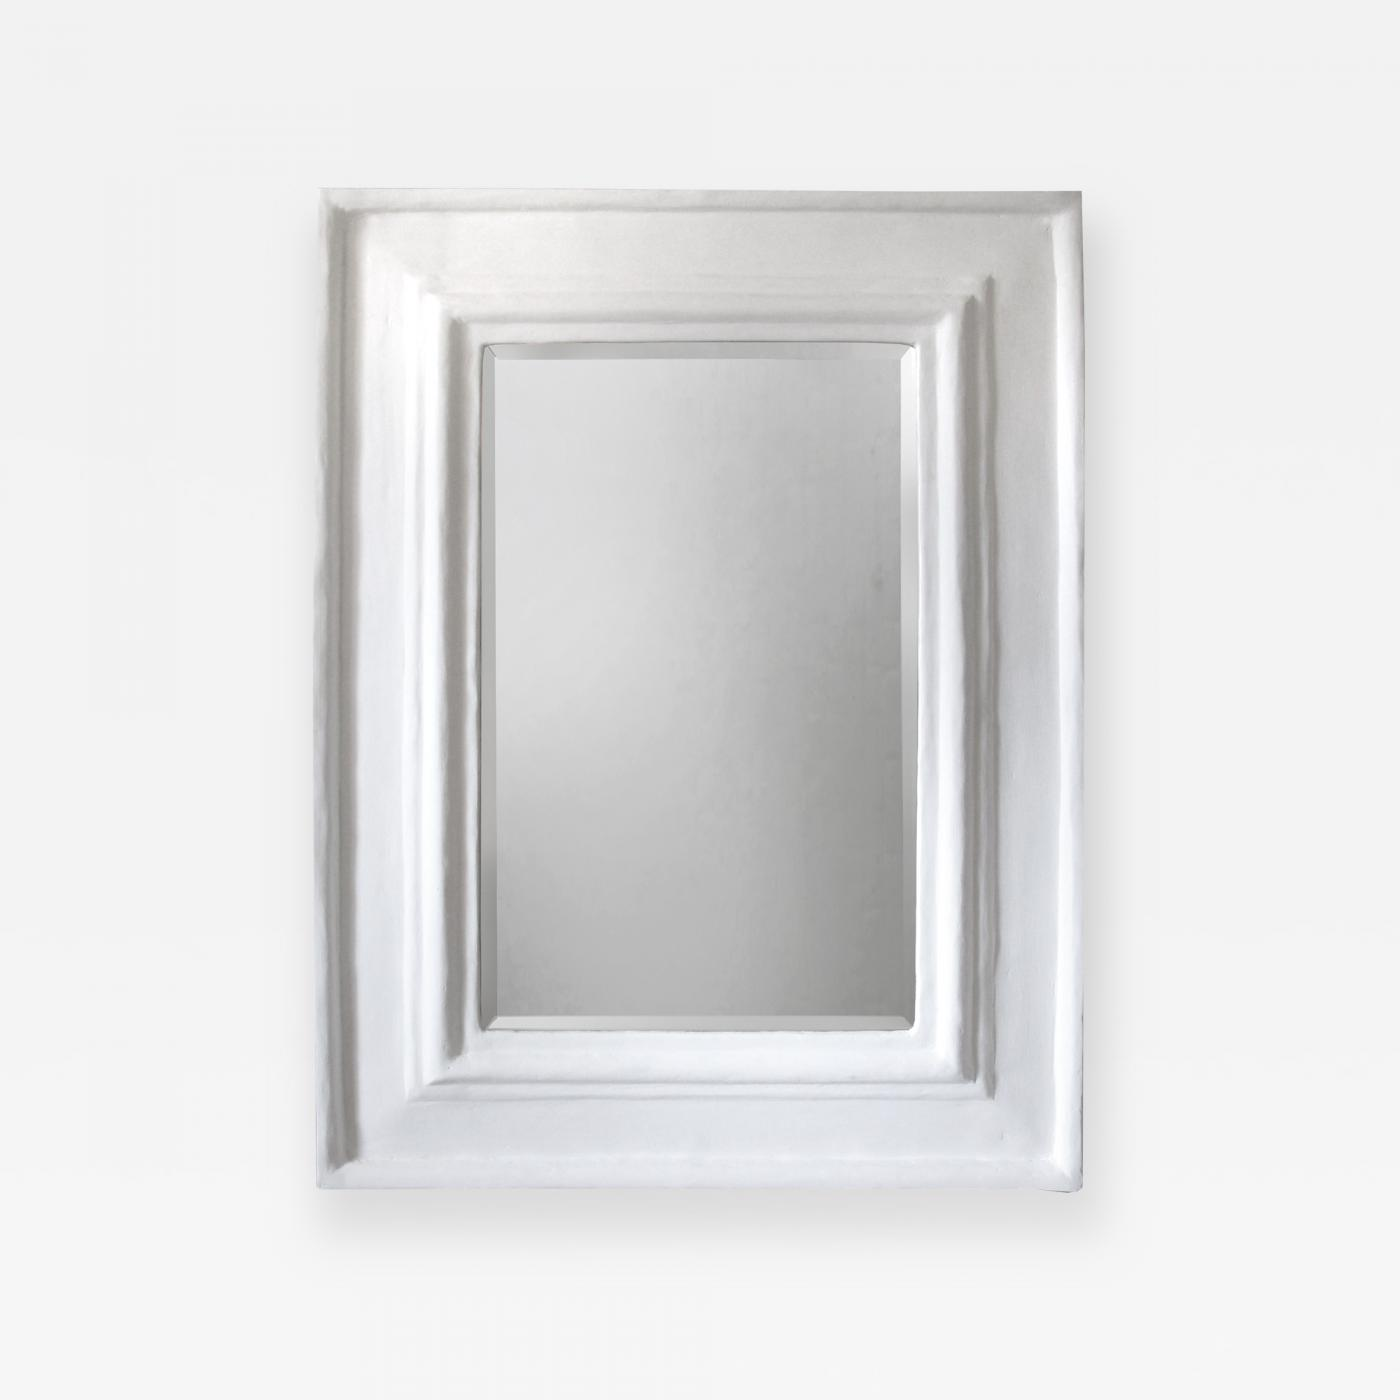 Beveled Mirror with Plaster Frame